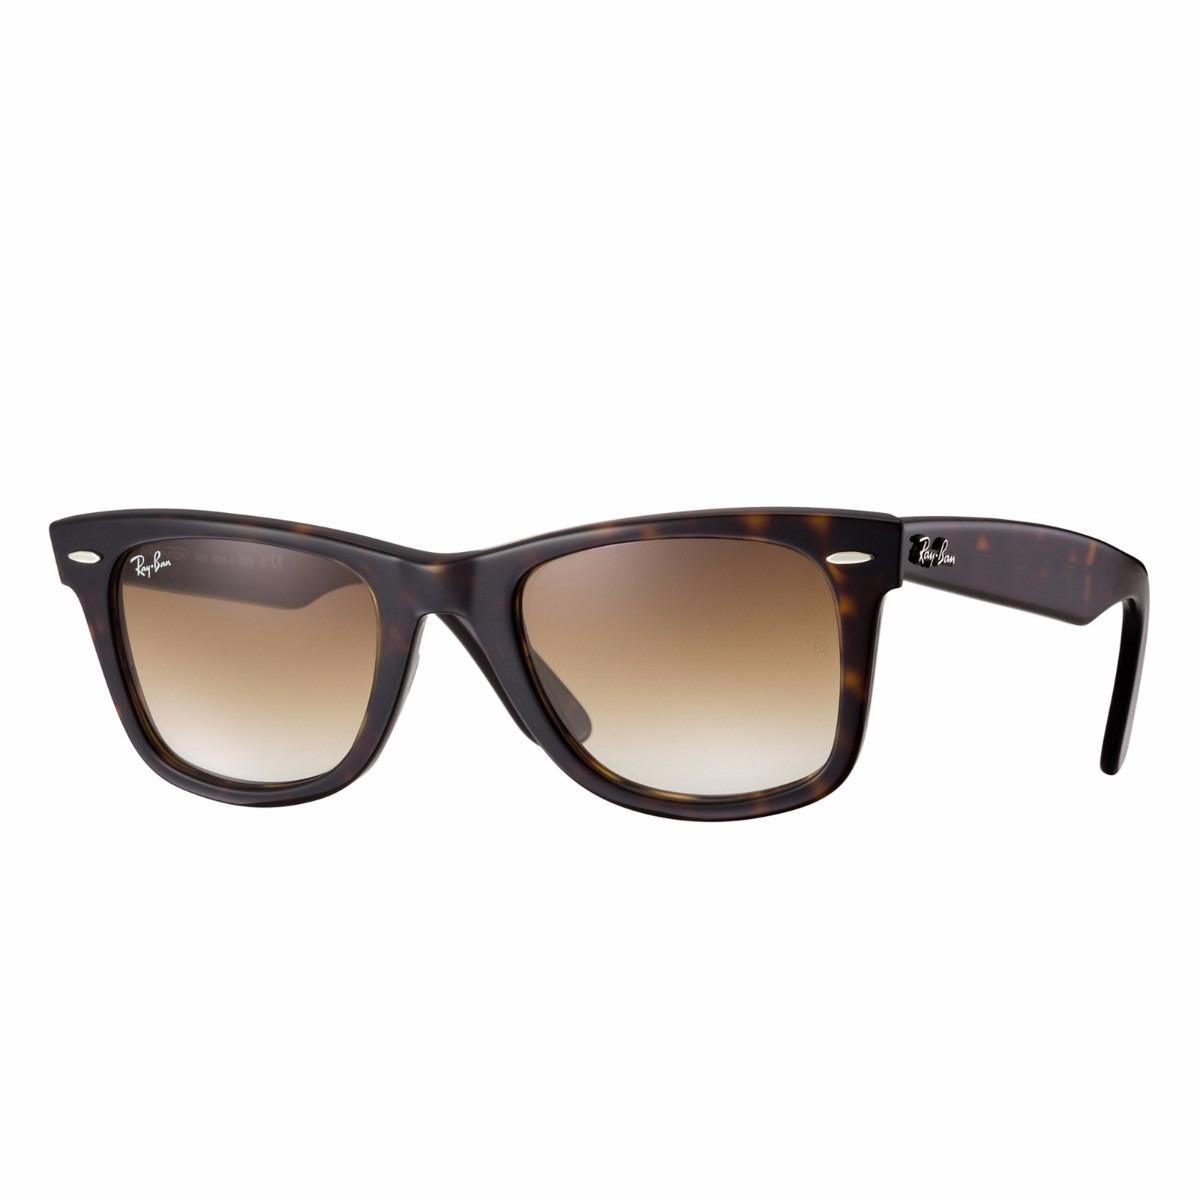 58f5f6157 oculos rayban wayfarer rb2140 masculino feminino oferta. Carregando zoom.